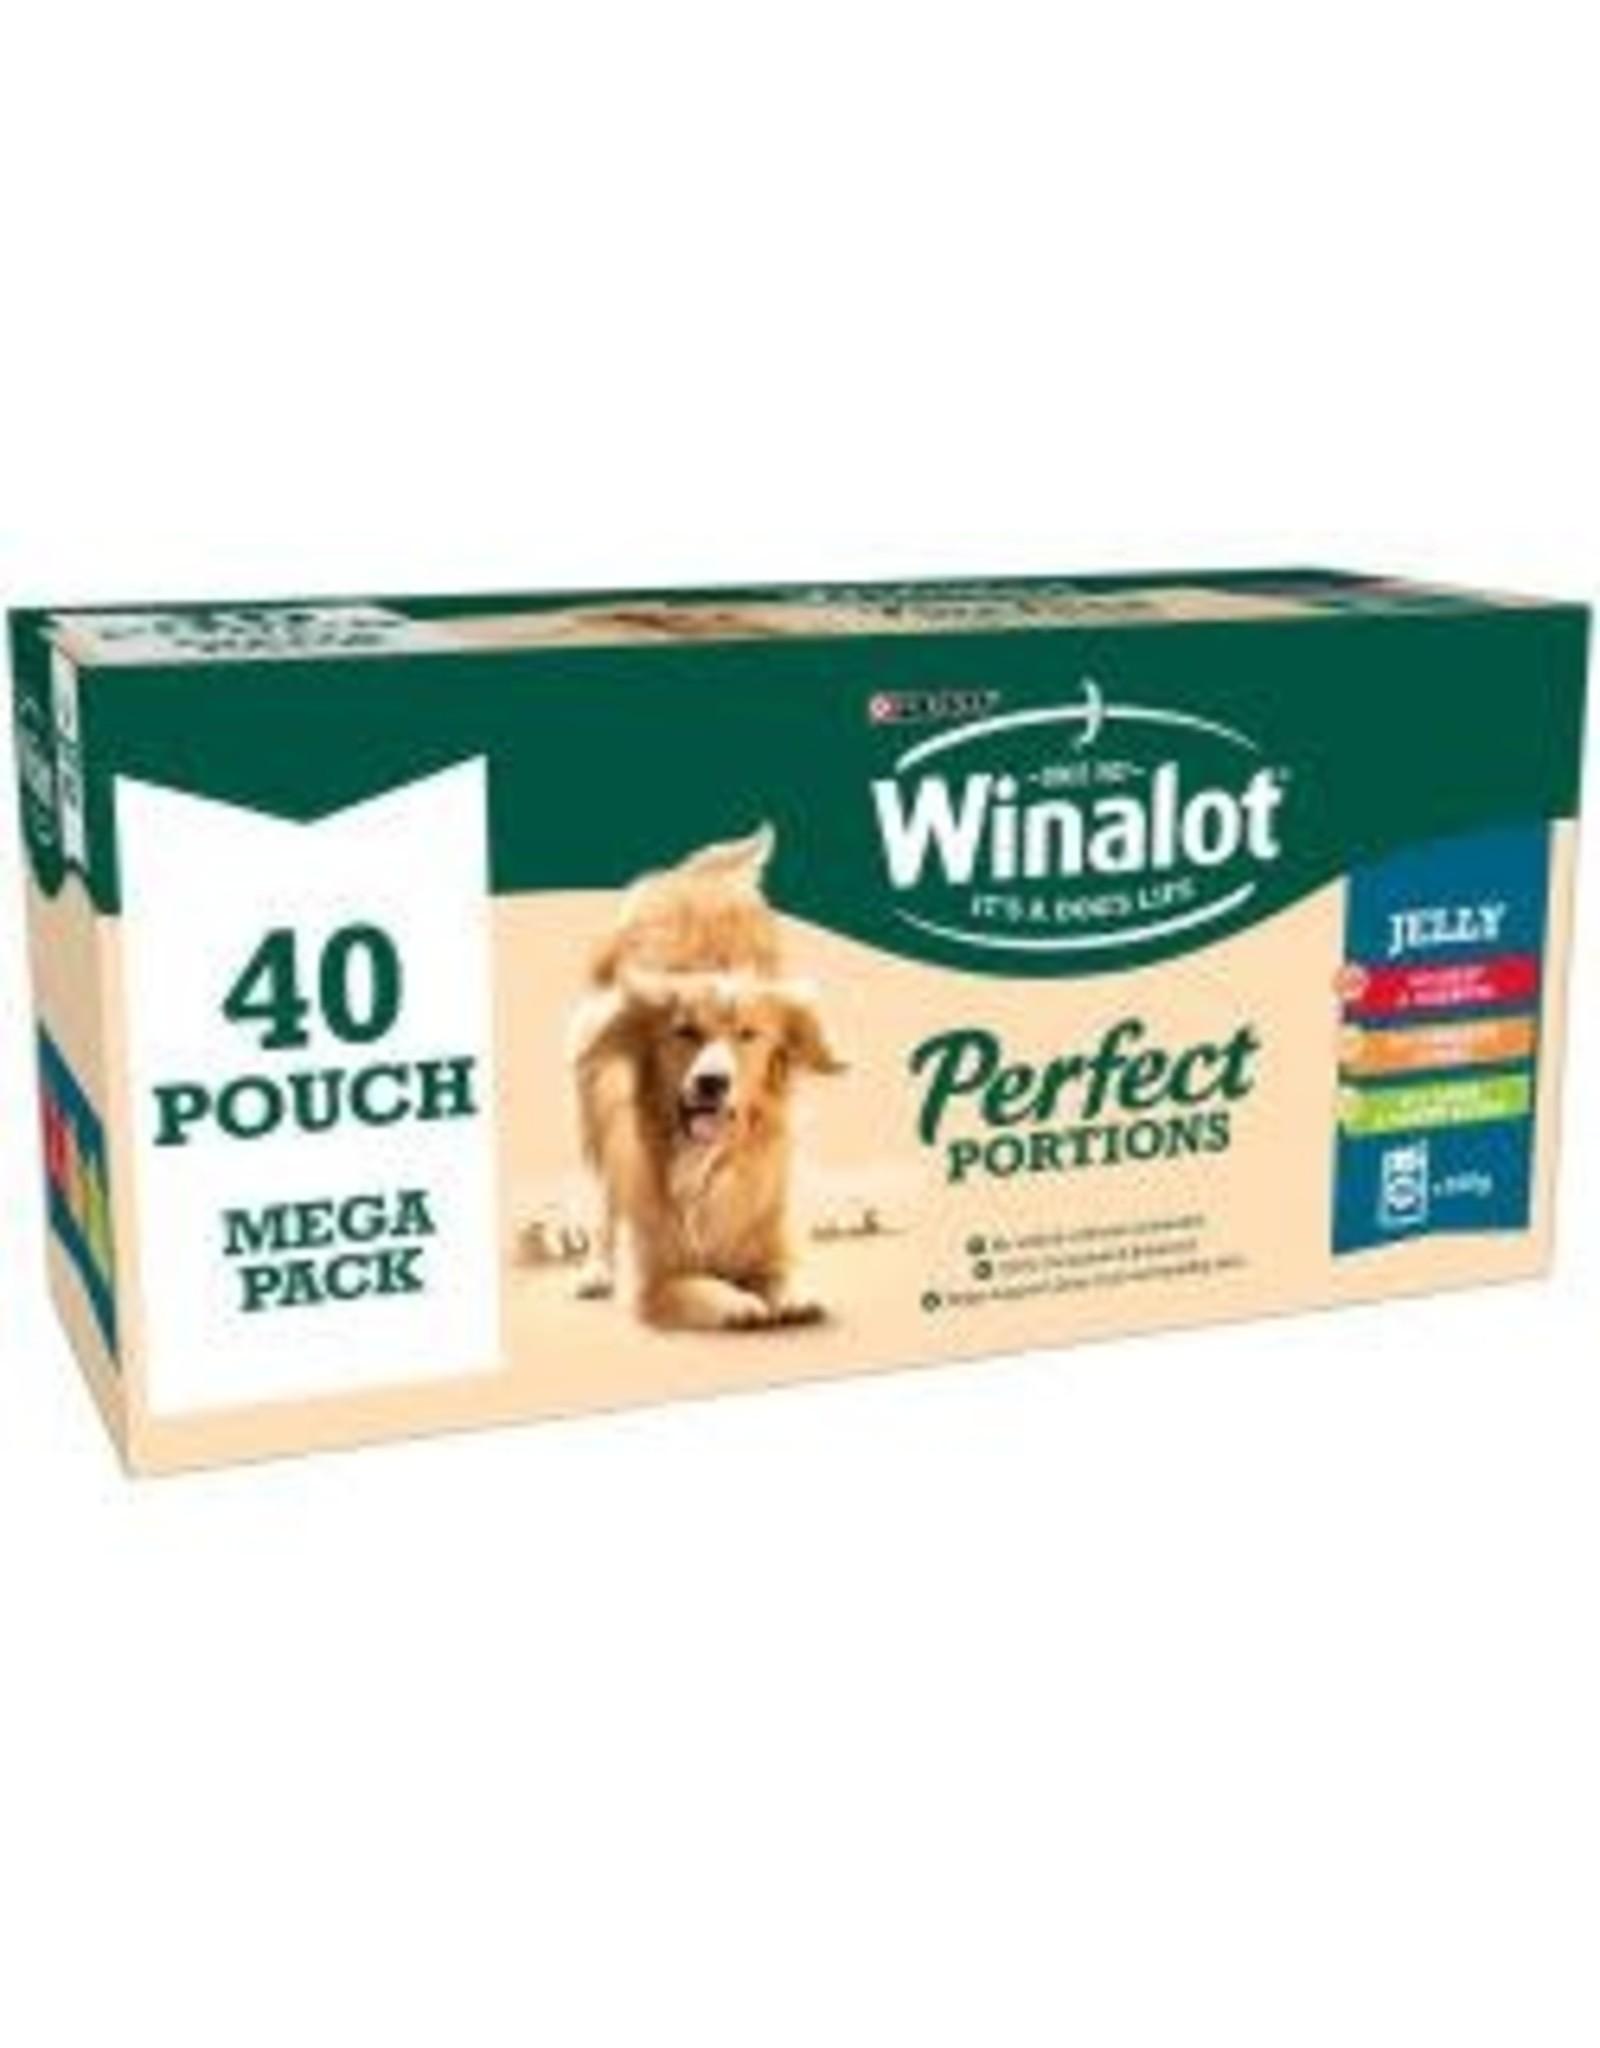 Winalot Winalot Pouch Mixed Chunks In Jelly 40 Pack